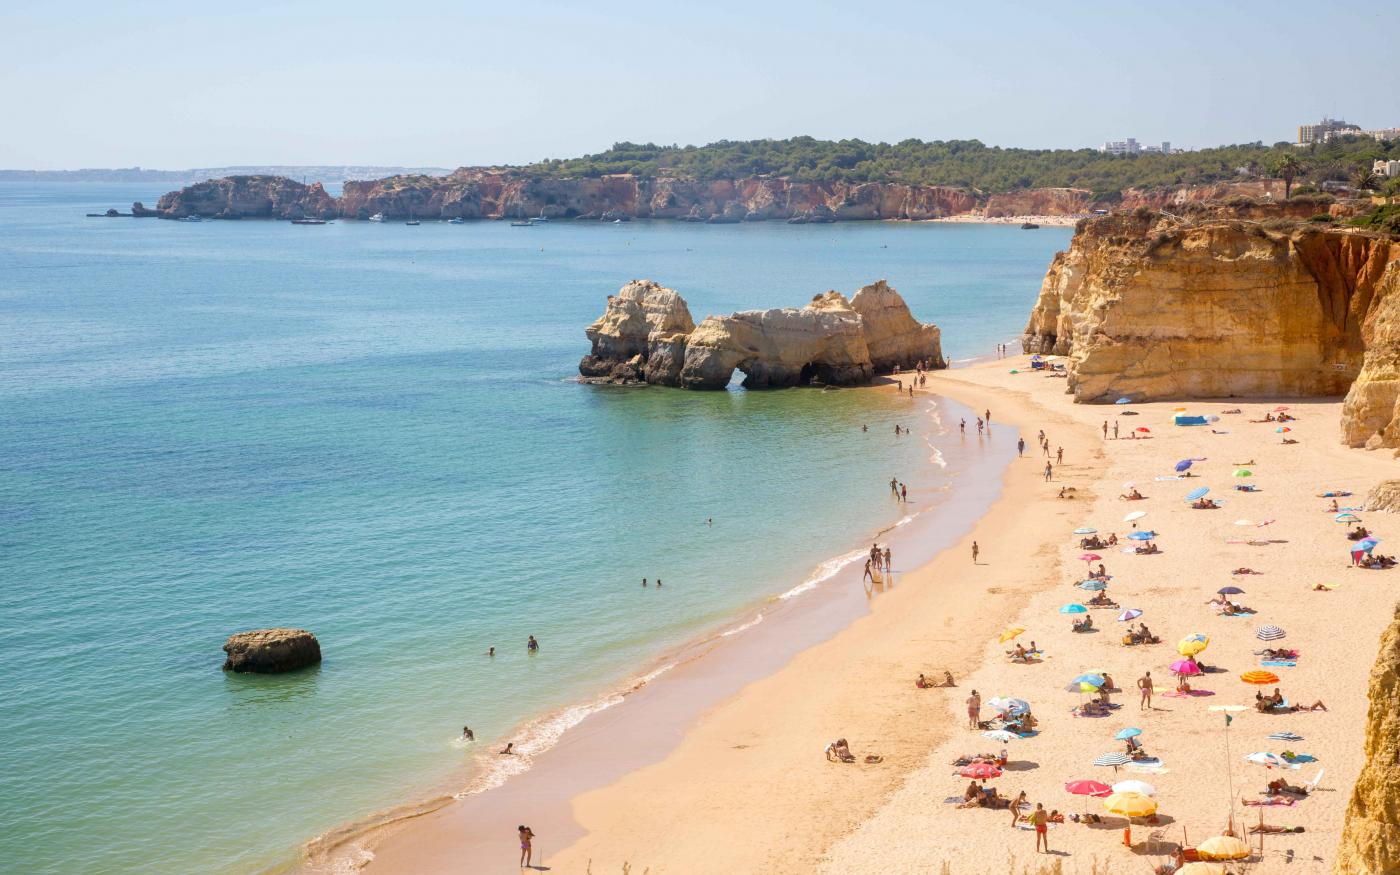 Algarve organiseert Formule 1 Grand Prix in oktober 2020